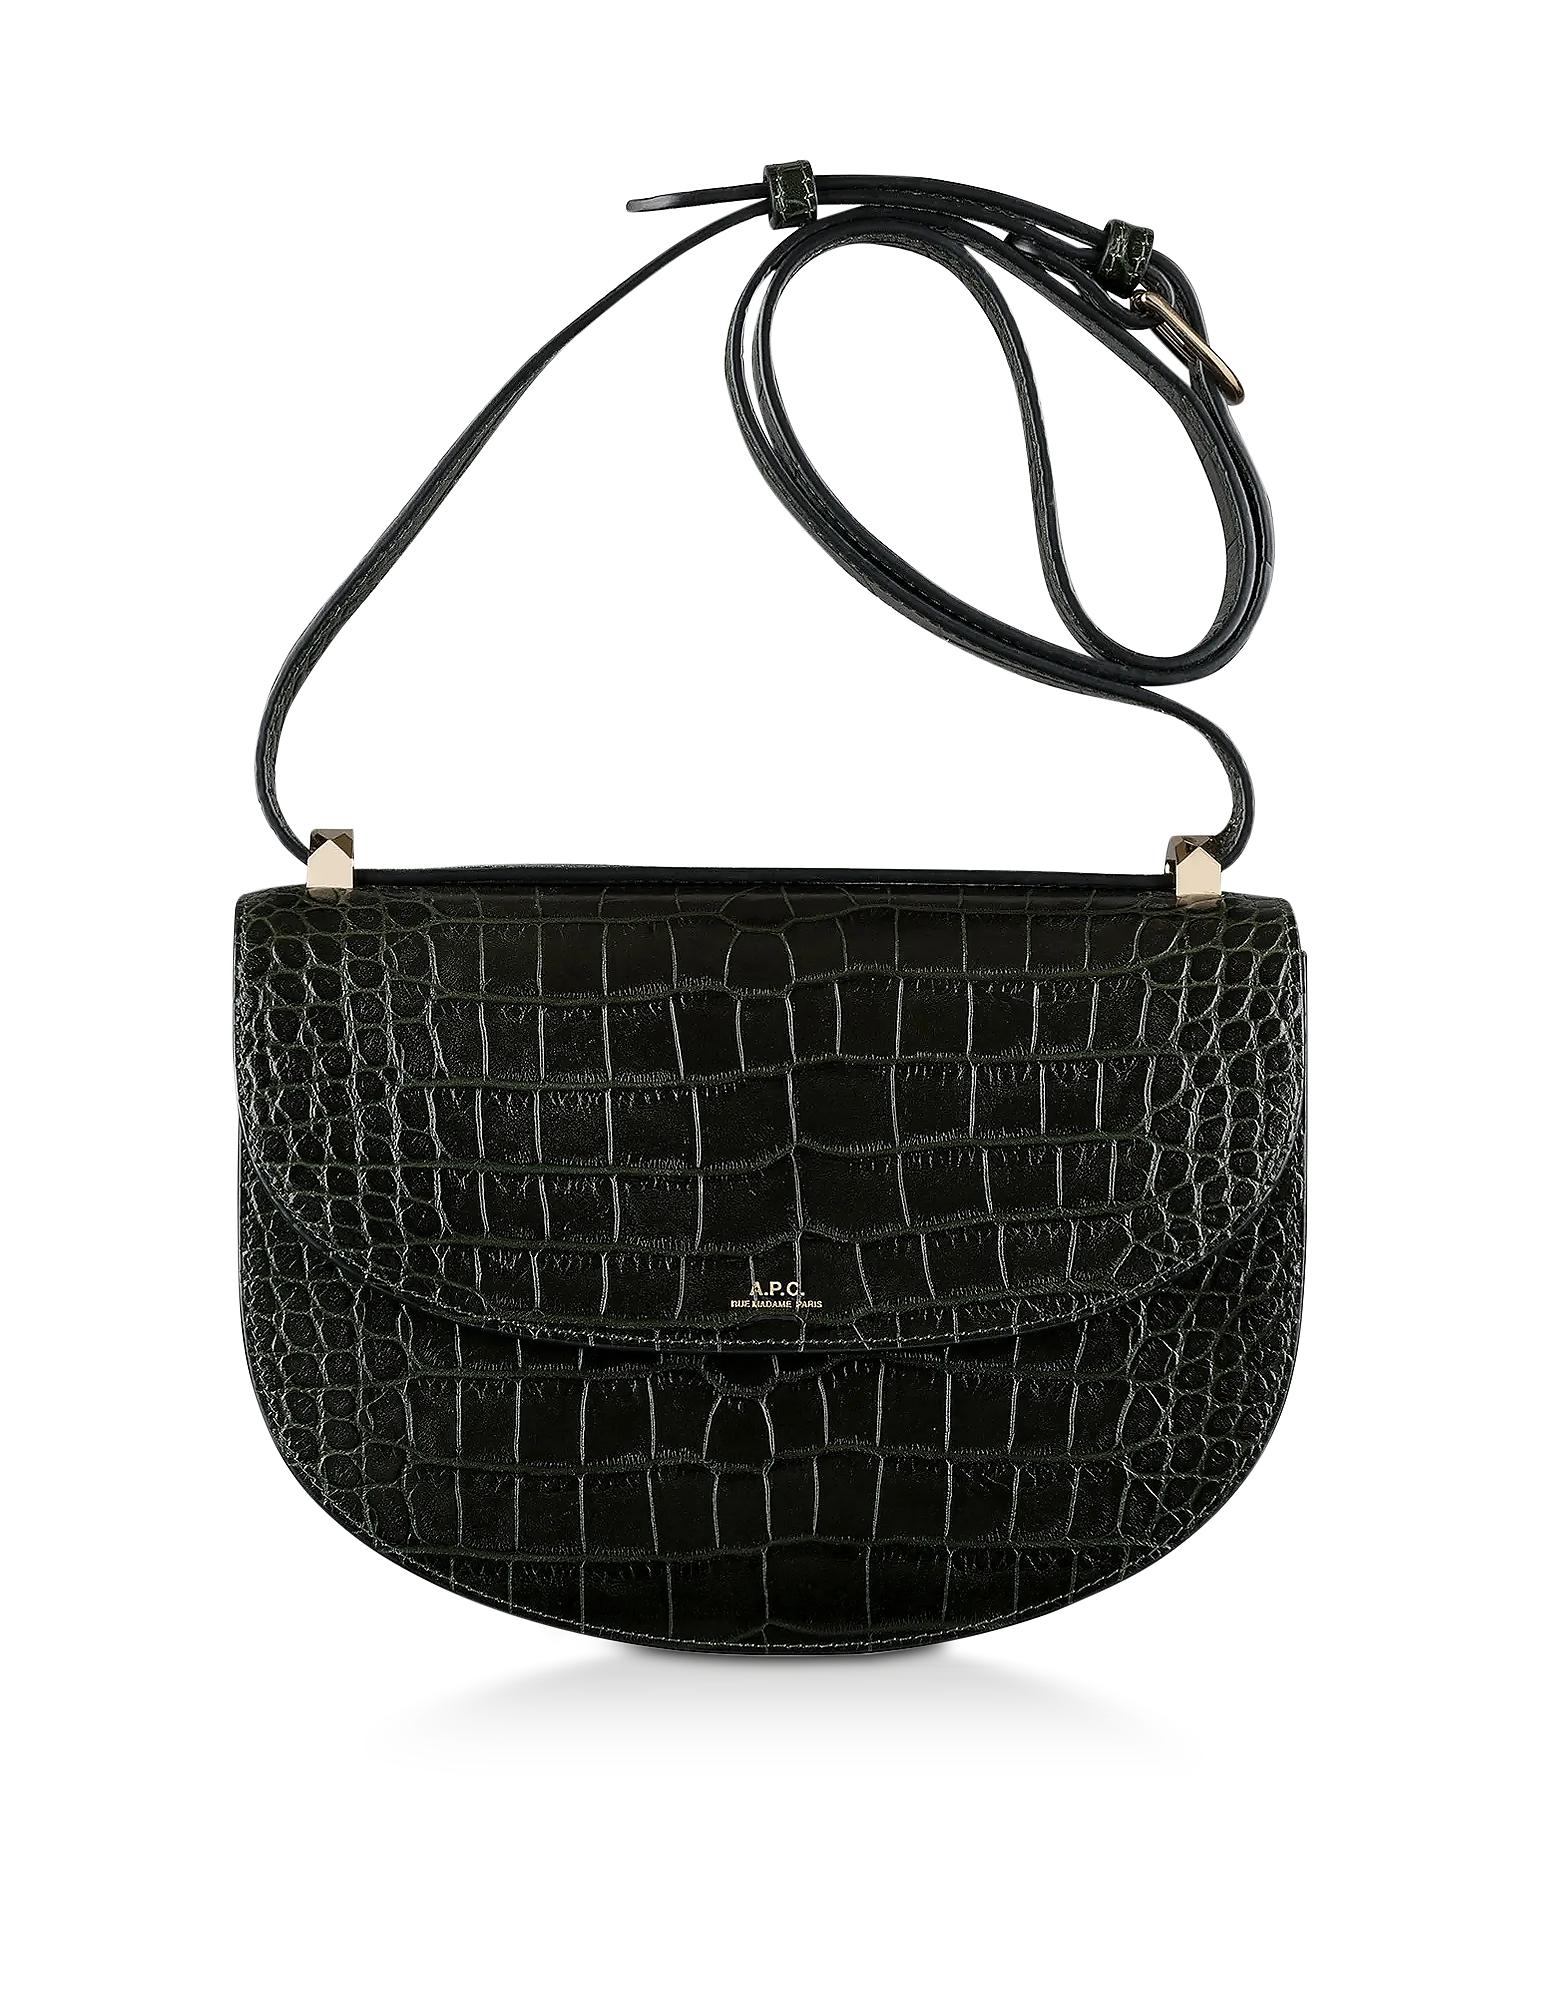 A.P.C. Designer Handbags, Dark Green Croco Embossed Leather Geneve Crossbody Bag